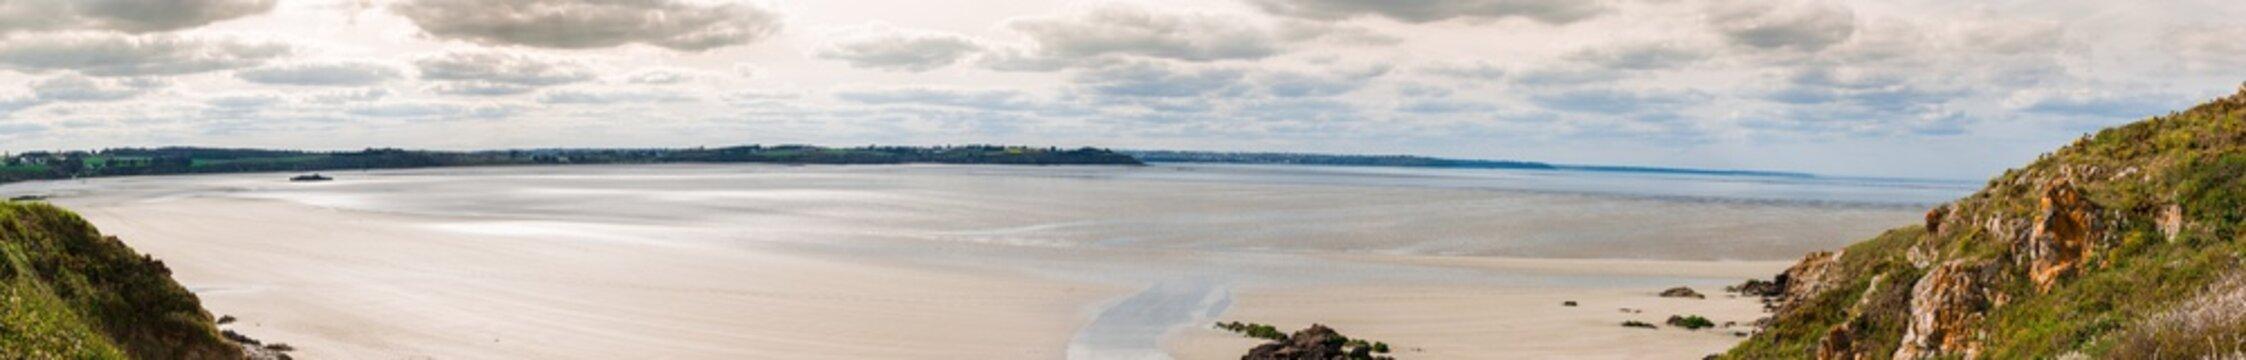 Panorama Baie Saint Brieuc